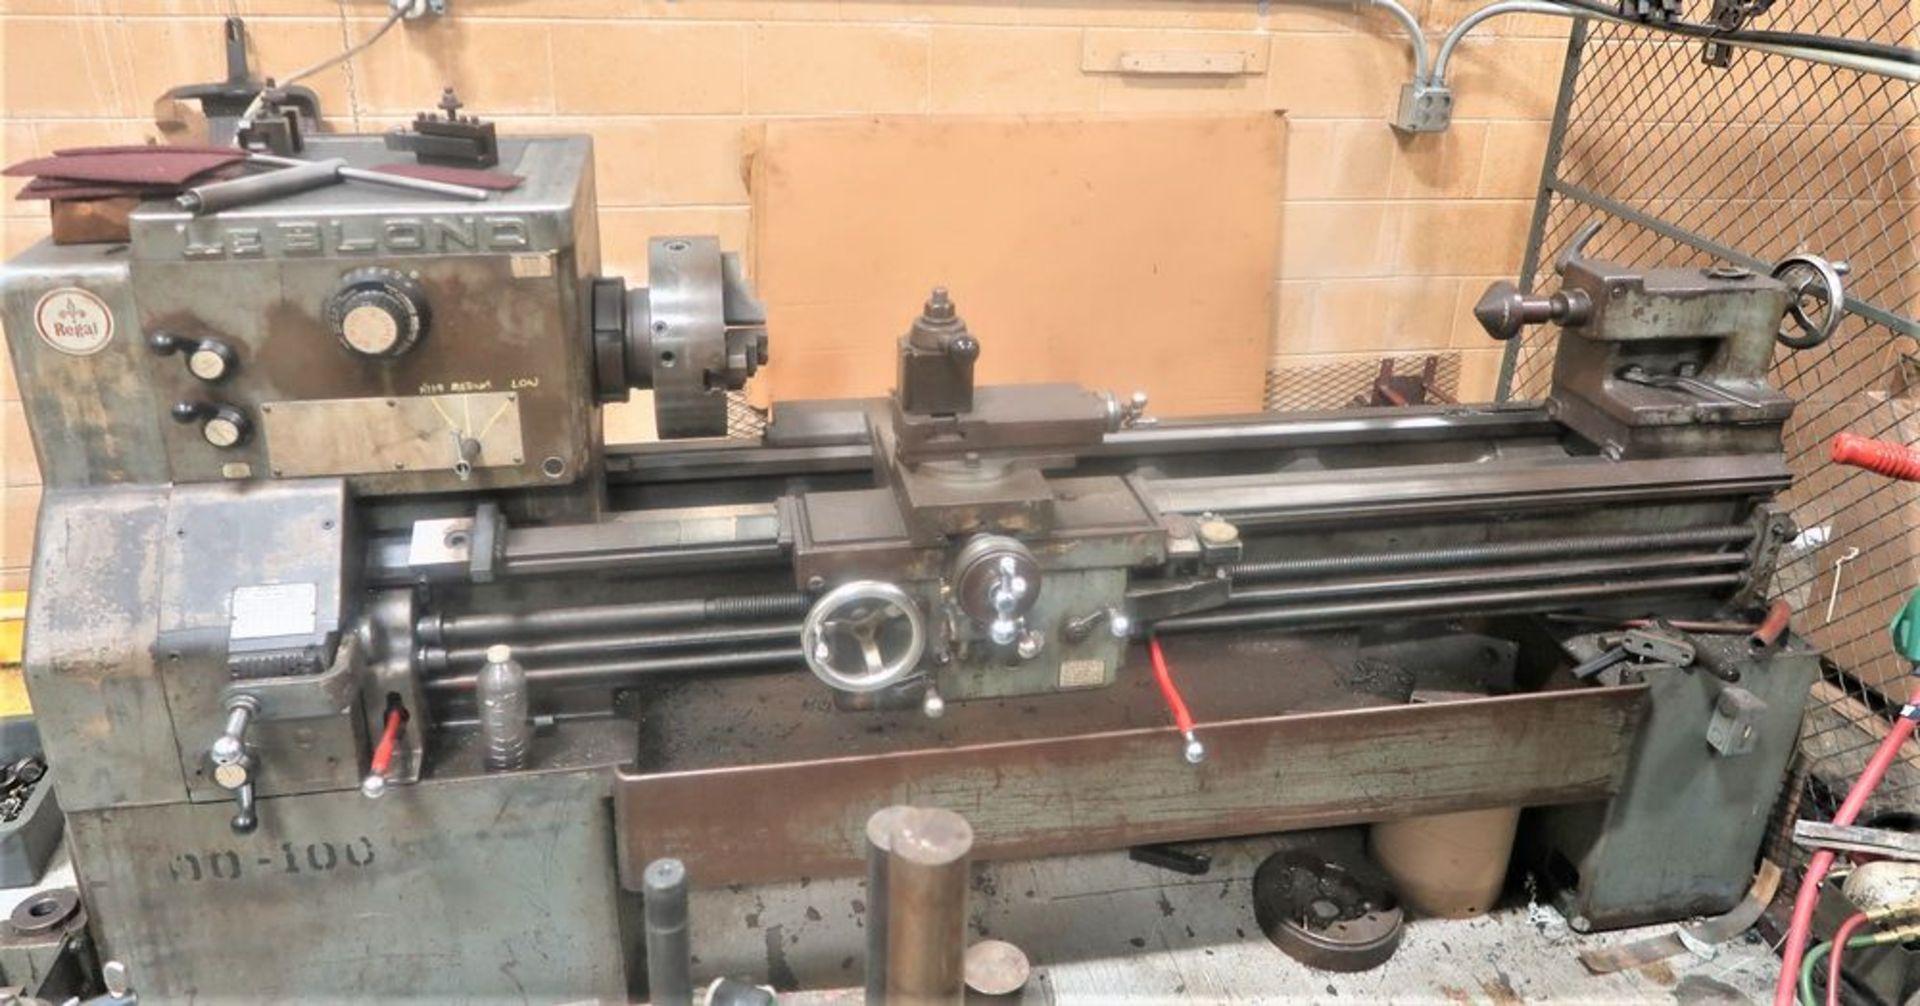 "19"" X 54"" LeBlond Regal Tool room Engine Lathe, S/N 5E179 - Image 5 of 5"